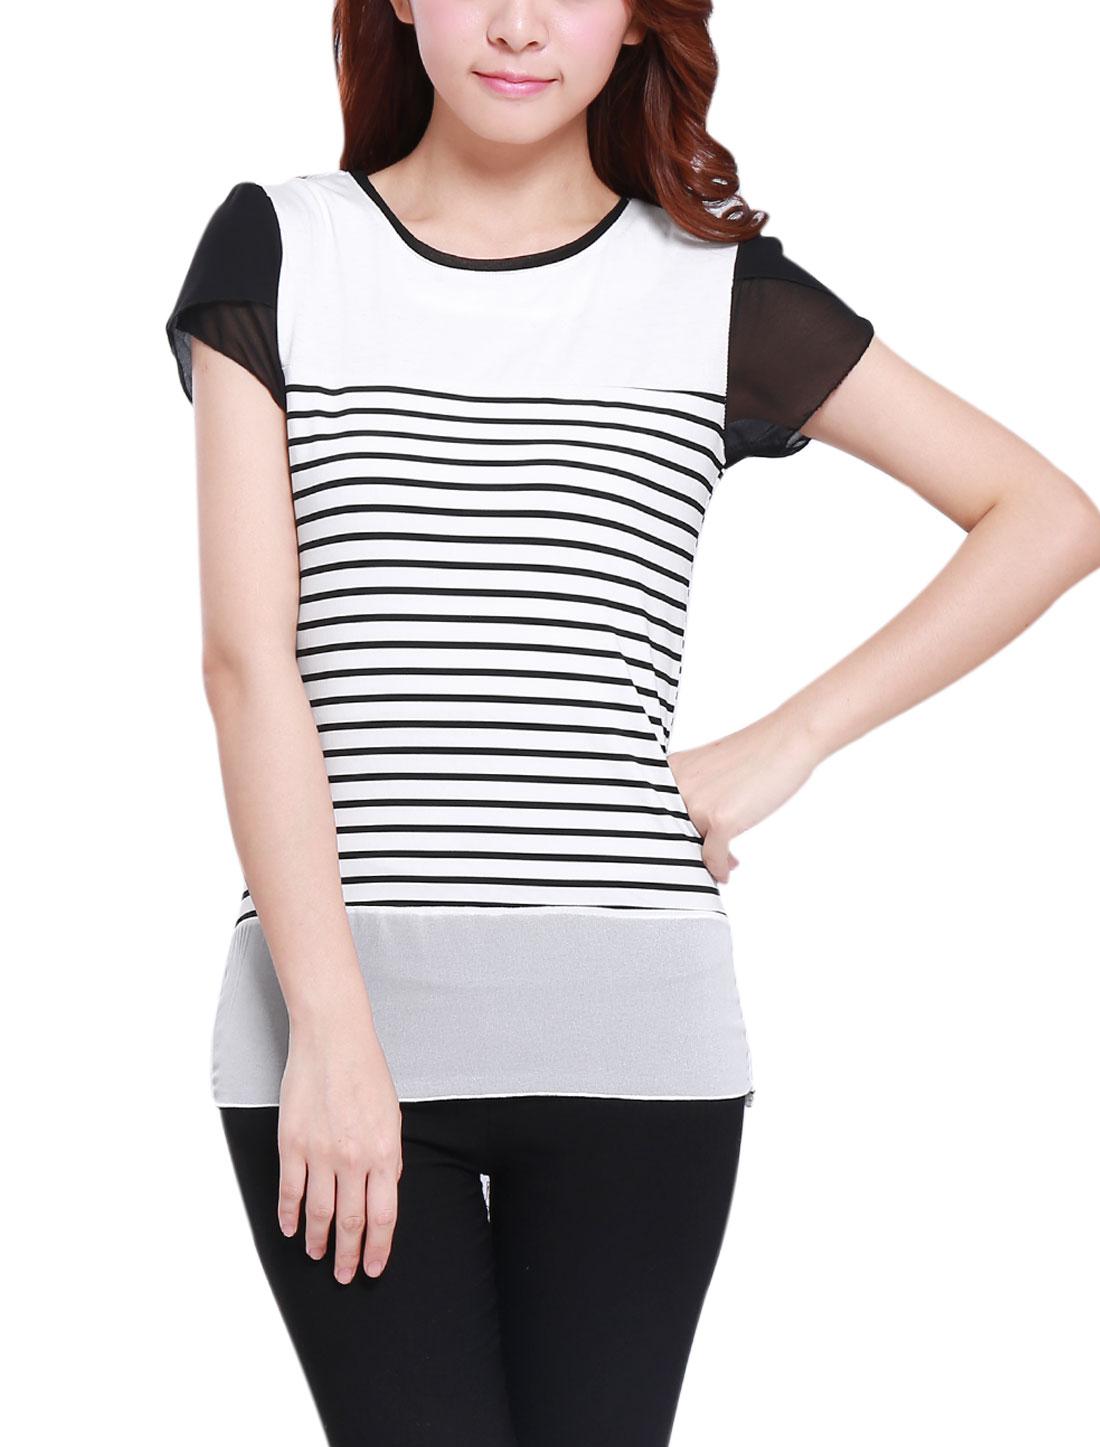 Lady Round Neck Patal Sleeve Stripes Chiffon Panel T-Shirt White Black M